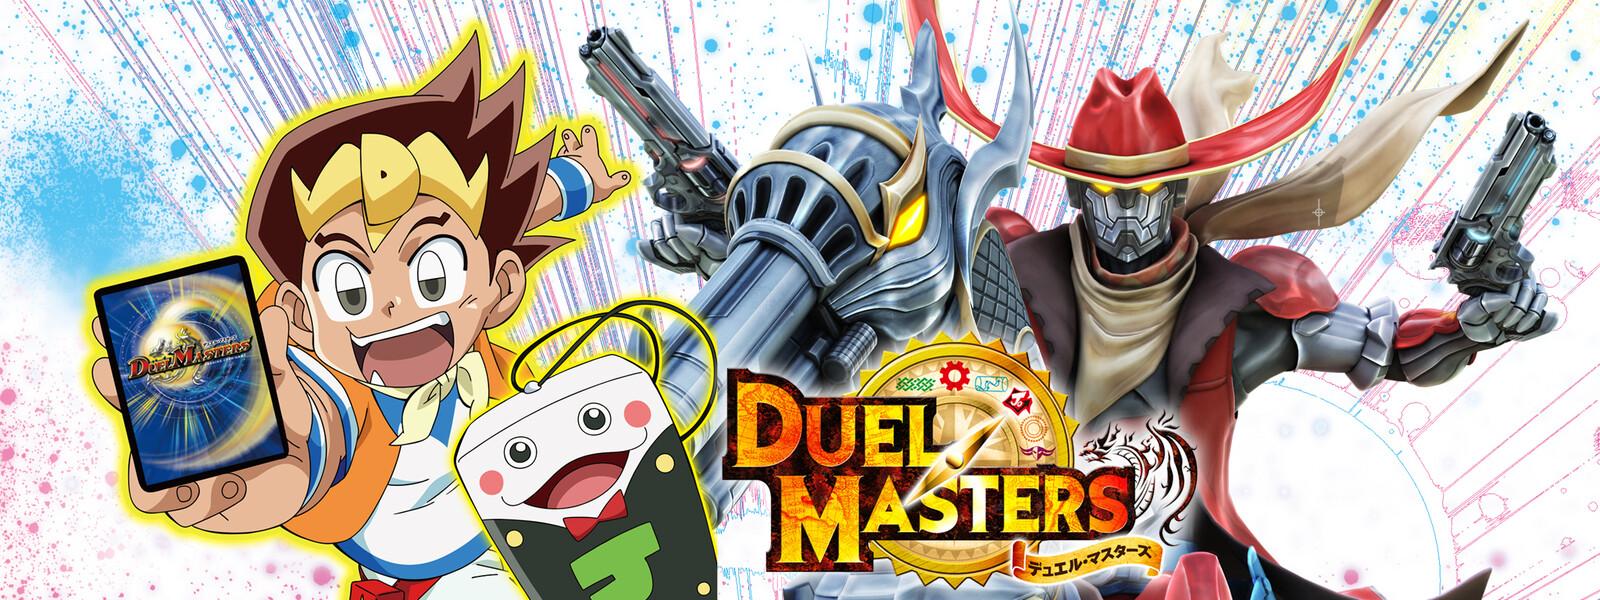 DUEL MASTERS(デュエル・マスターズ2017、デュエマ)